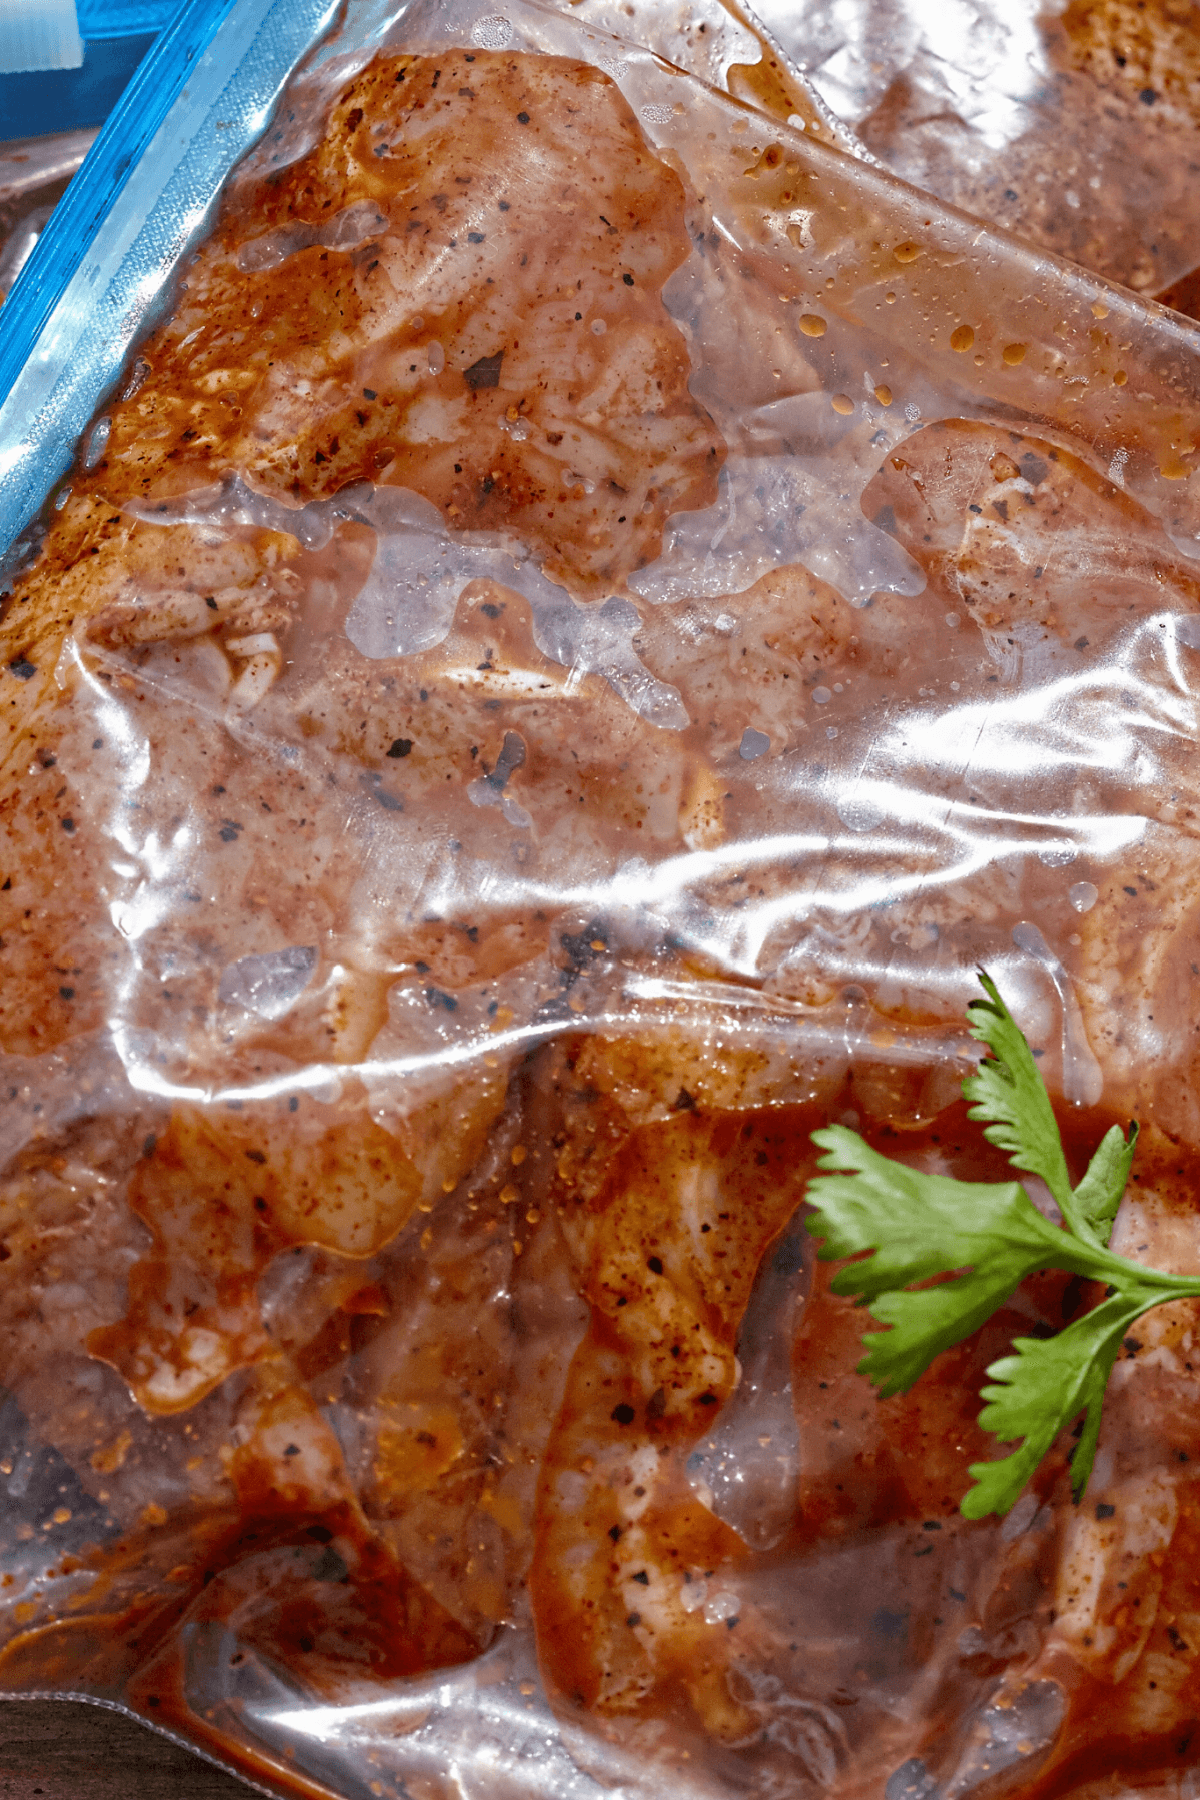 Pork marinating in the all-purpose marinade.